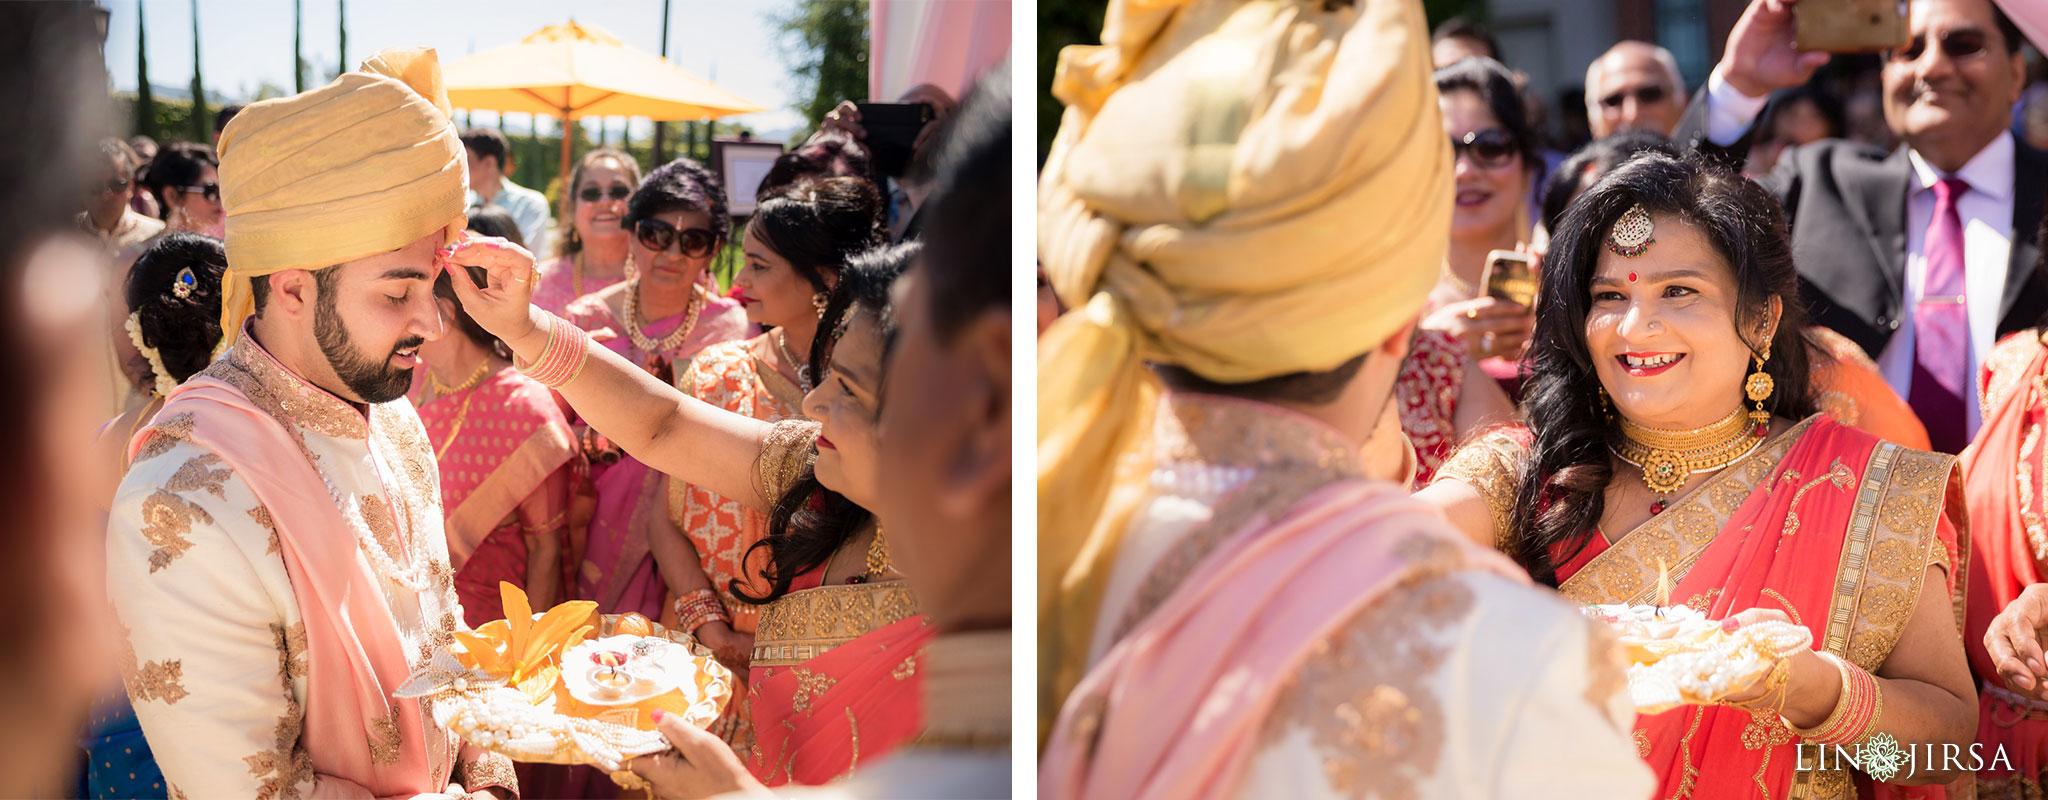 25 four seasons westlake village indian wedding photography